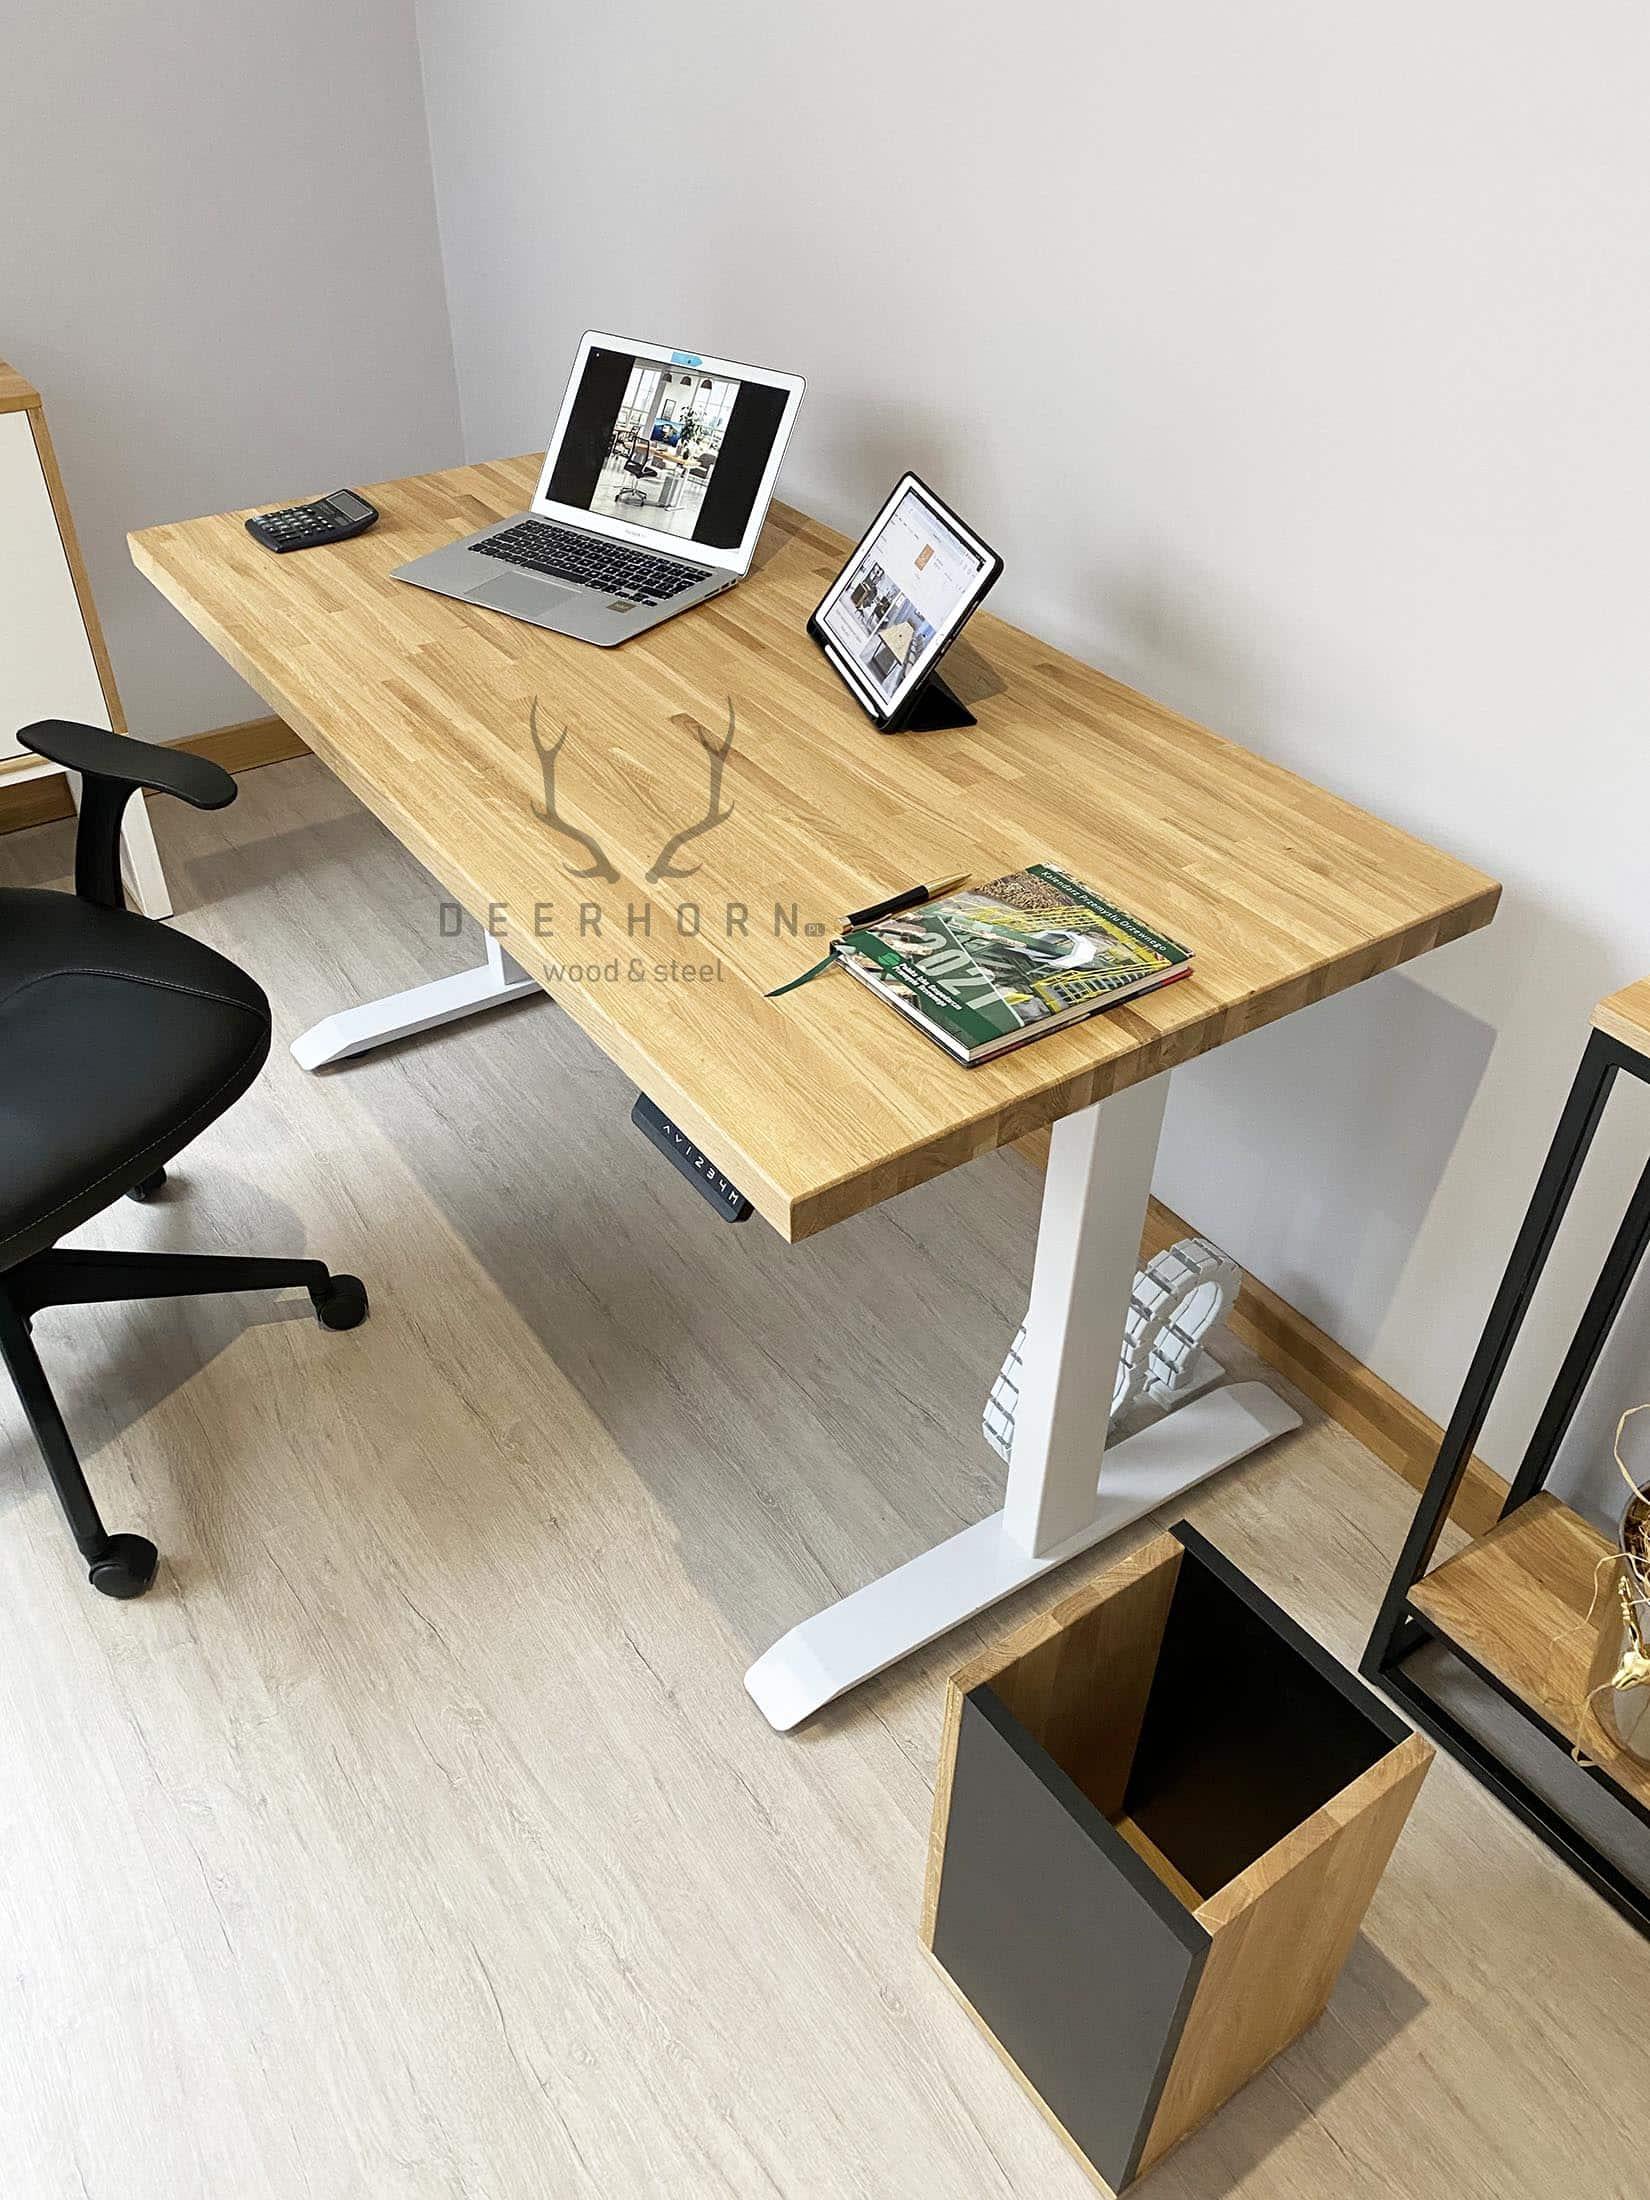 biale biurko zregulacja industrial